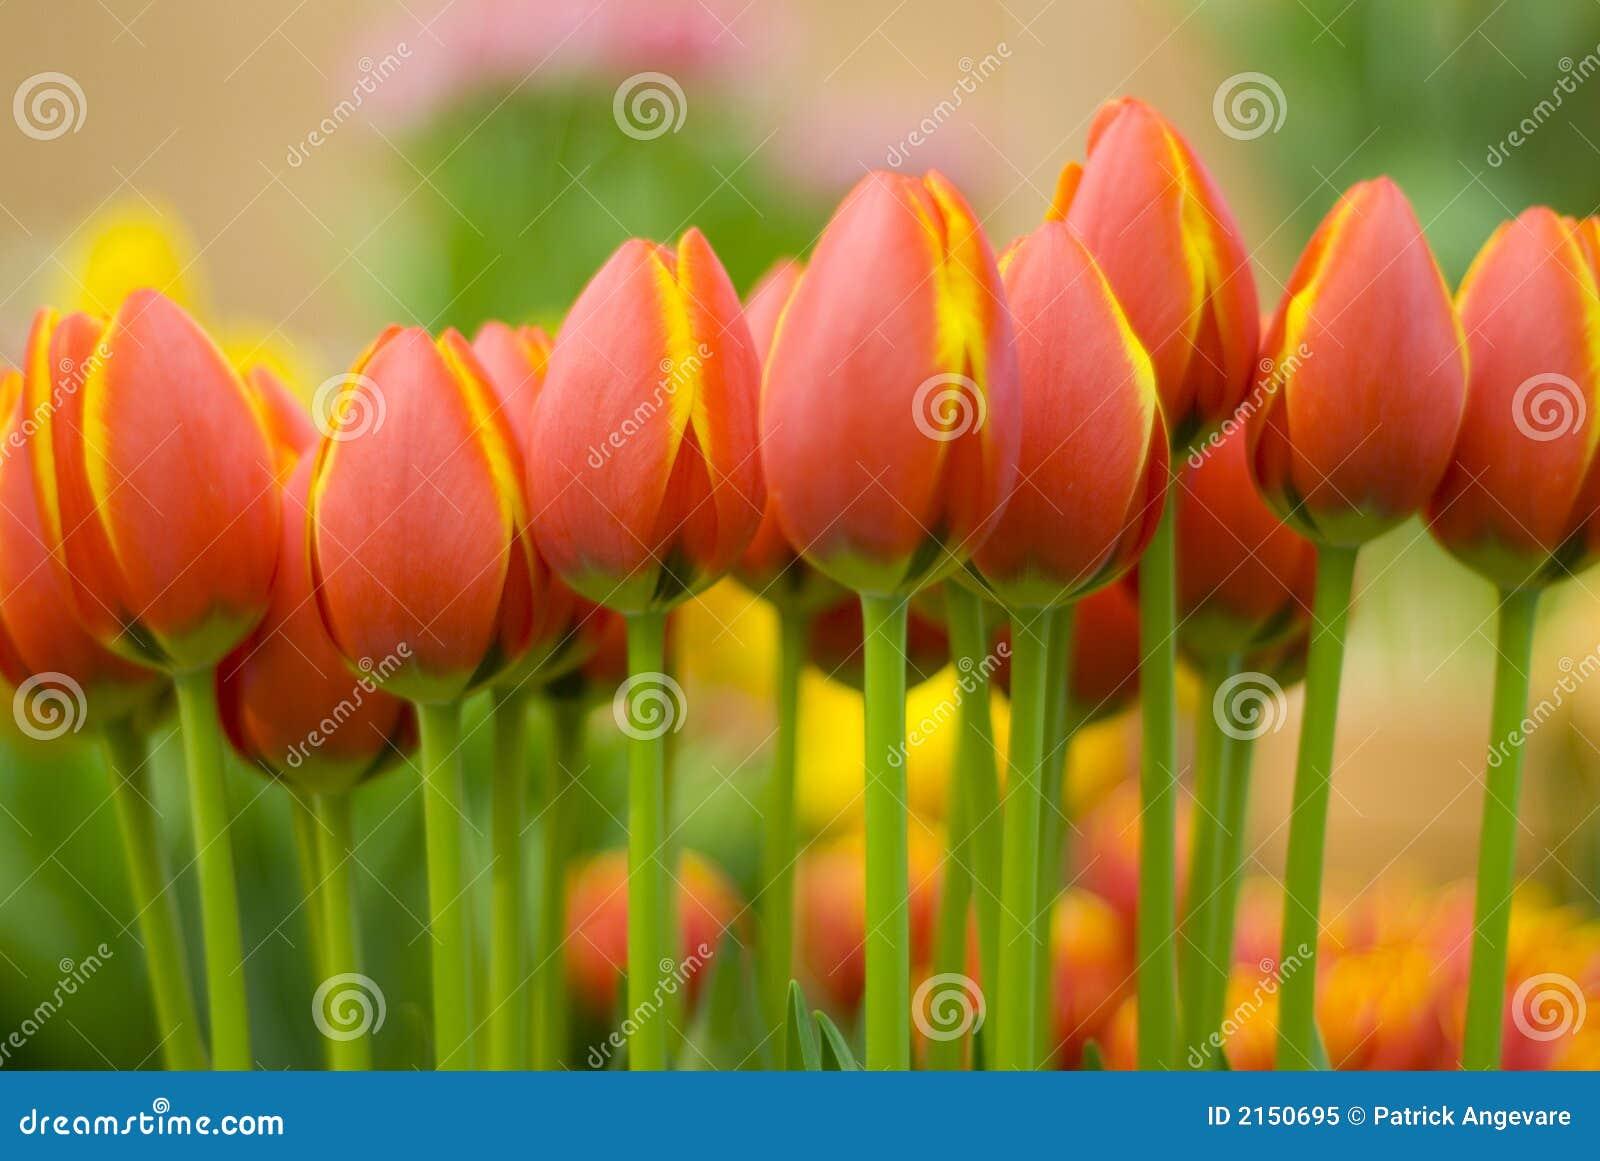 Tulipanes amarillo naranja imagen de archivo imagen de - Amarillo naranja ...